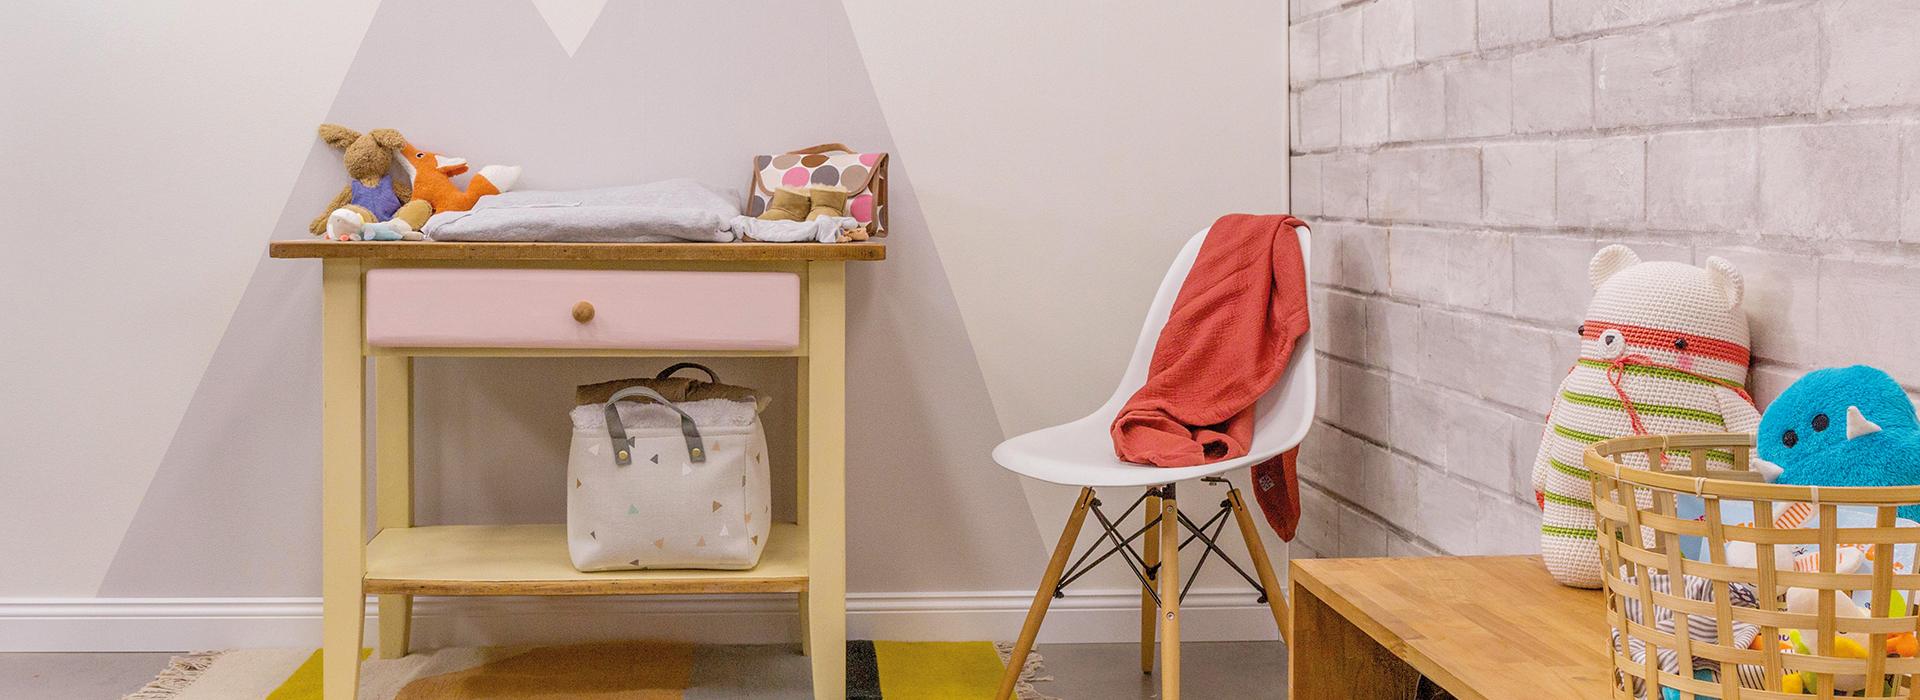 Full Size of Kreative Wandgestaltung Mit Schablonen Anleitung Wagner Regal Kinderzimmer Regale Sofa Weiß Kinderzimmer Wandschablonen Kinderzimmer